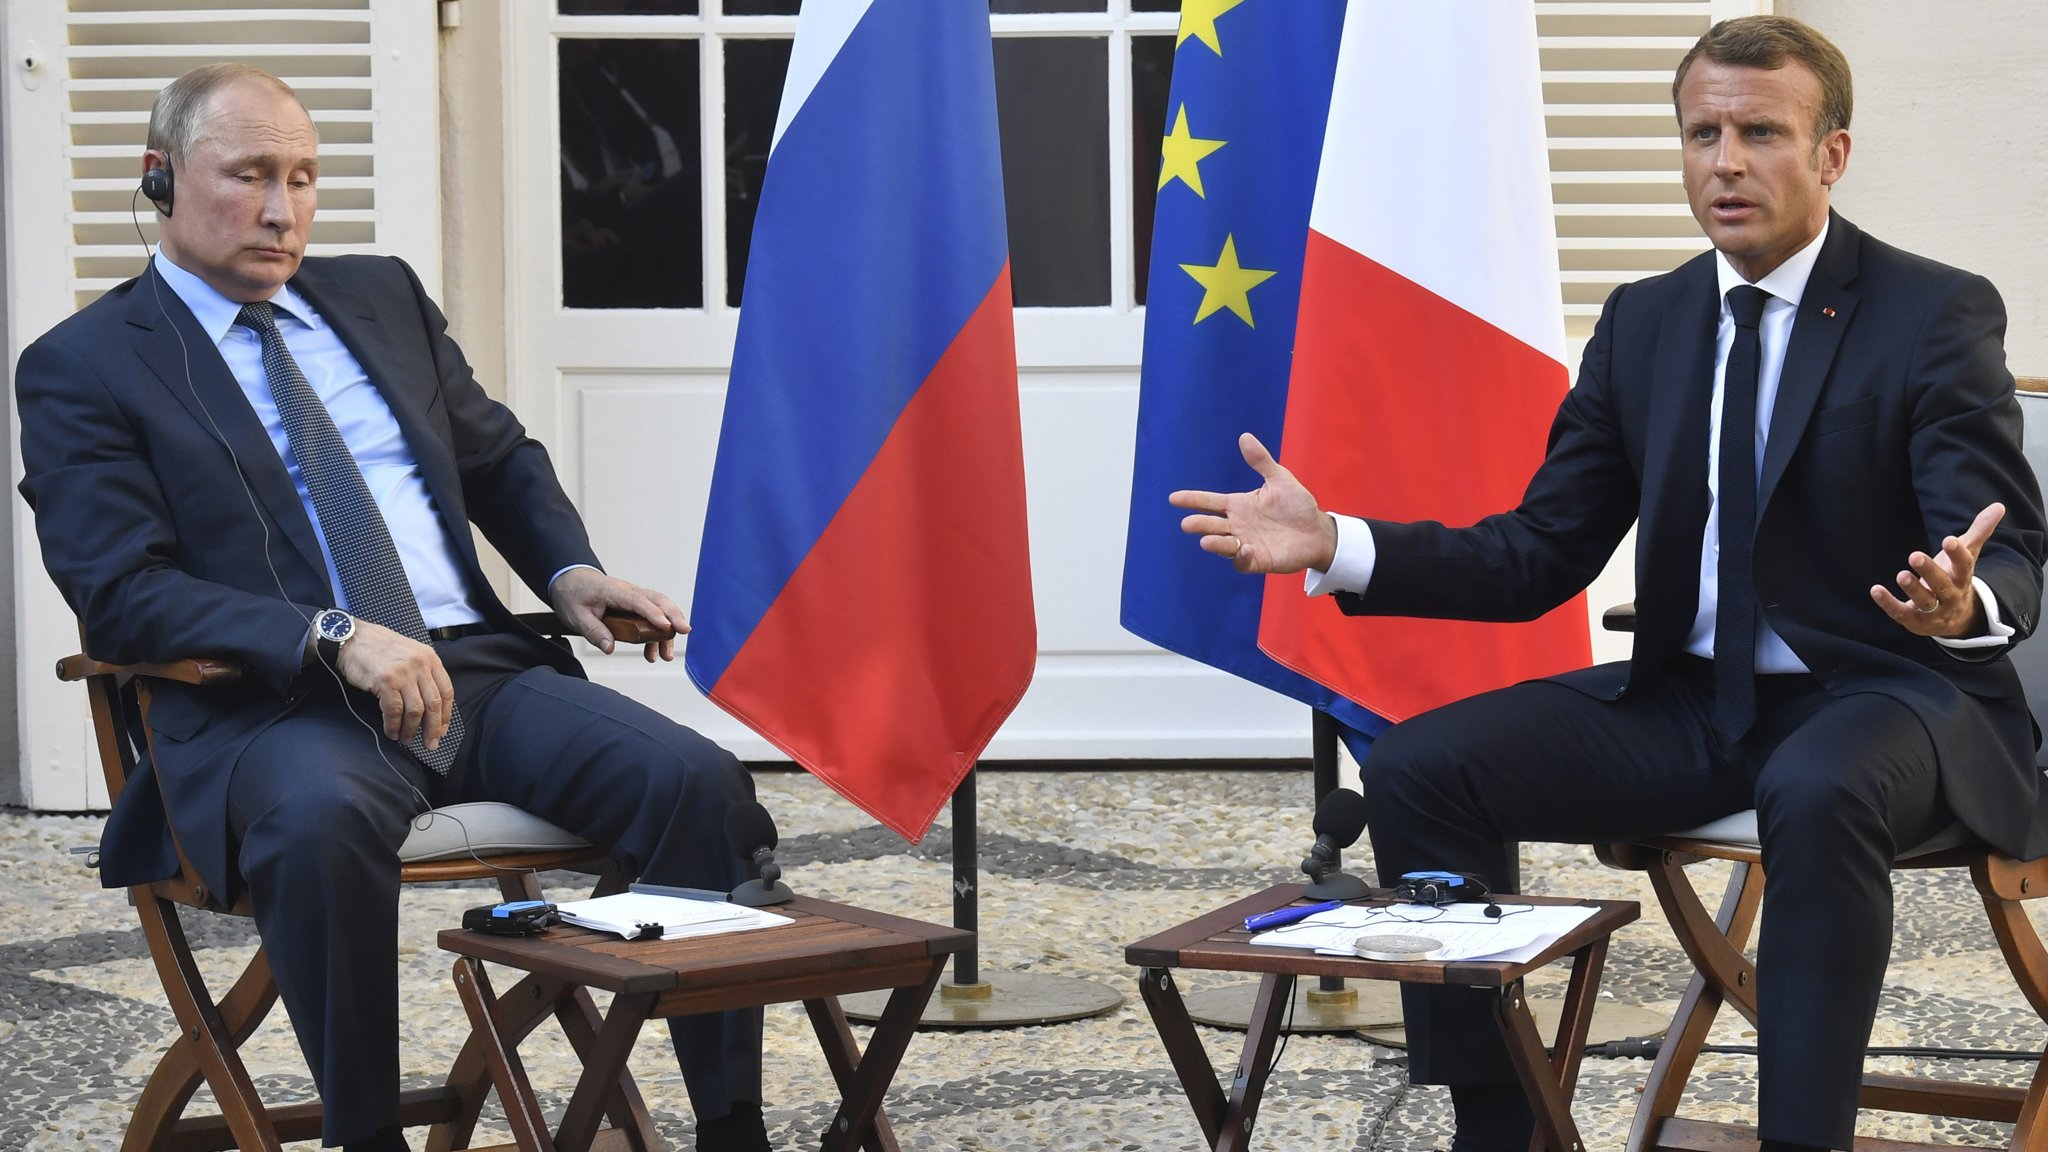 Emmanuel Macron's pivot to Russia sparks EU unease